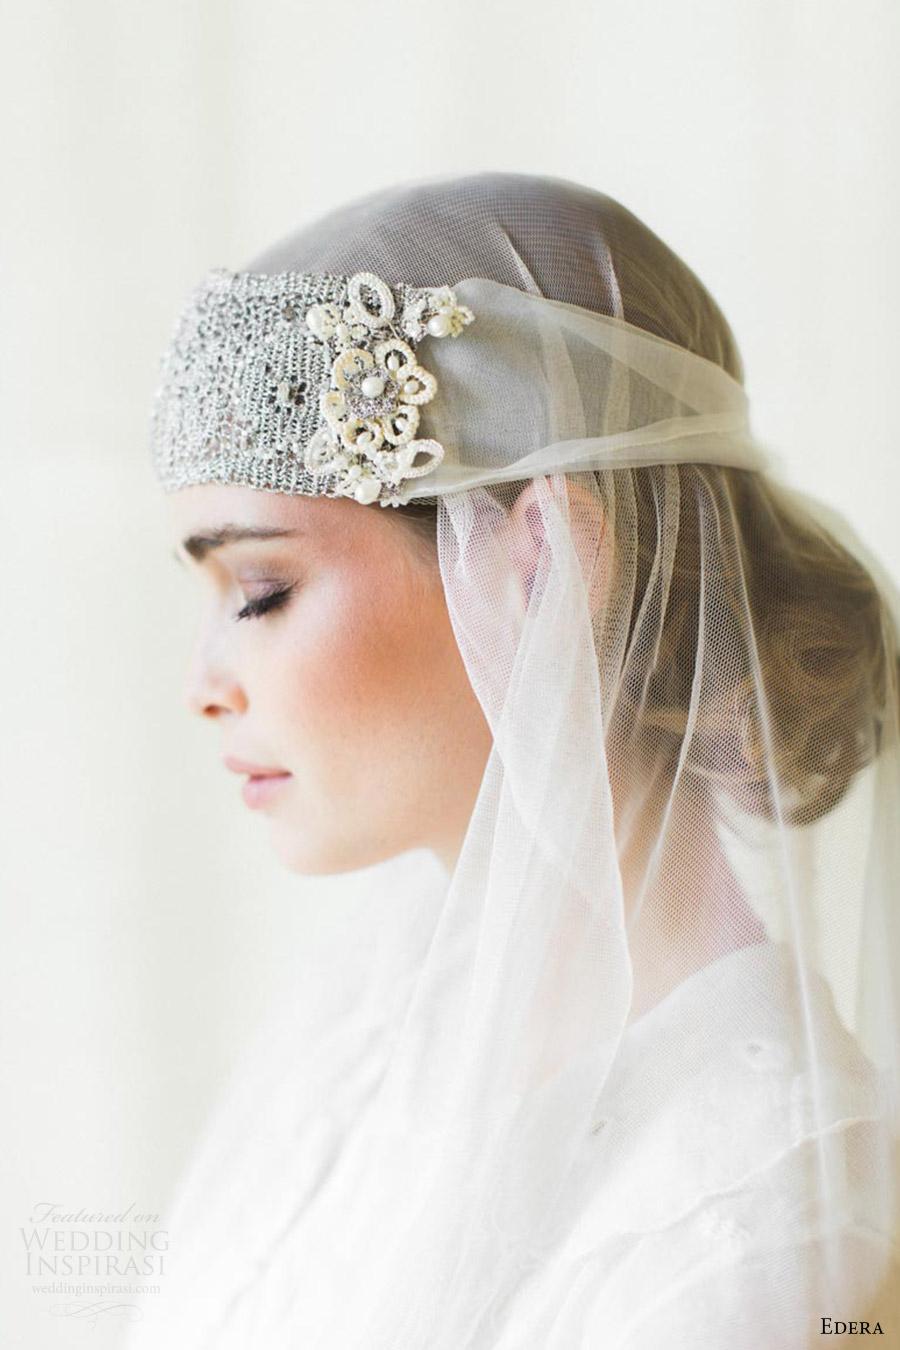 edera jewelry 2016 bridal accessories collection aquarelle (camille) bandeau headband sv